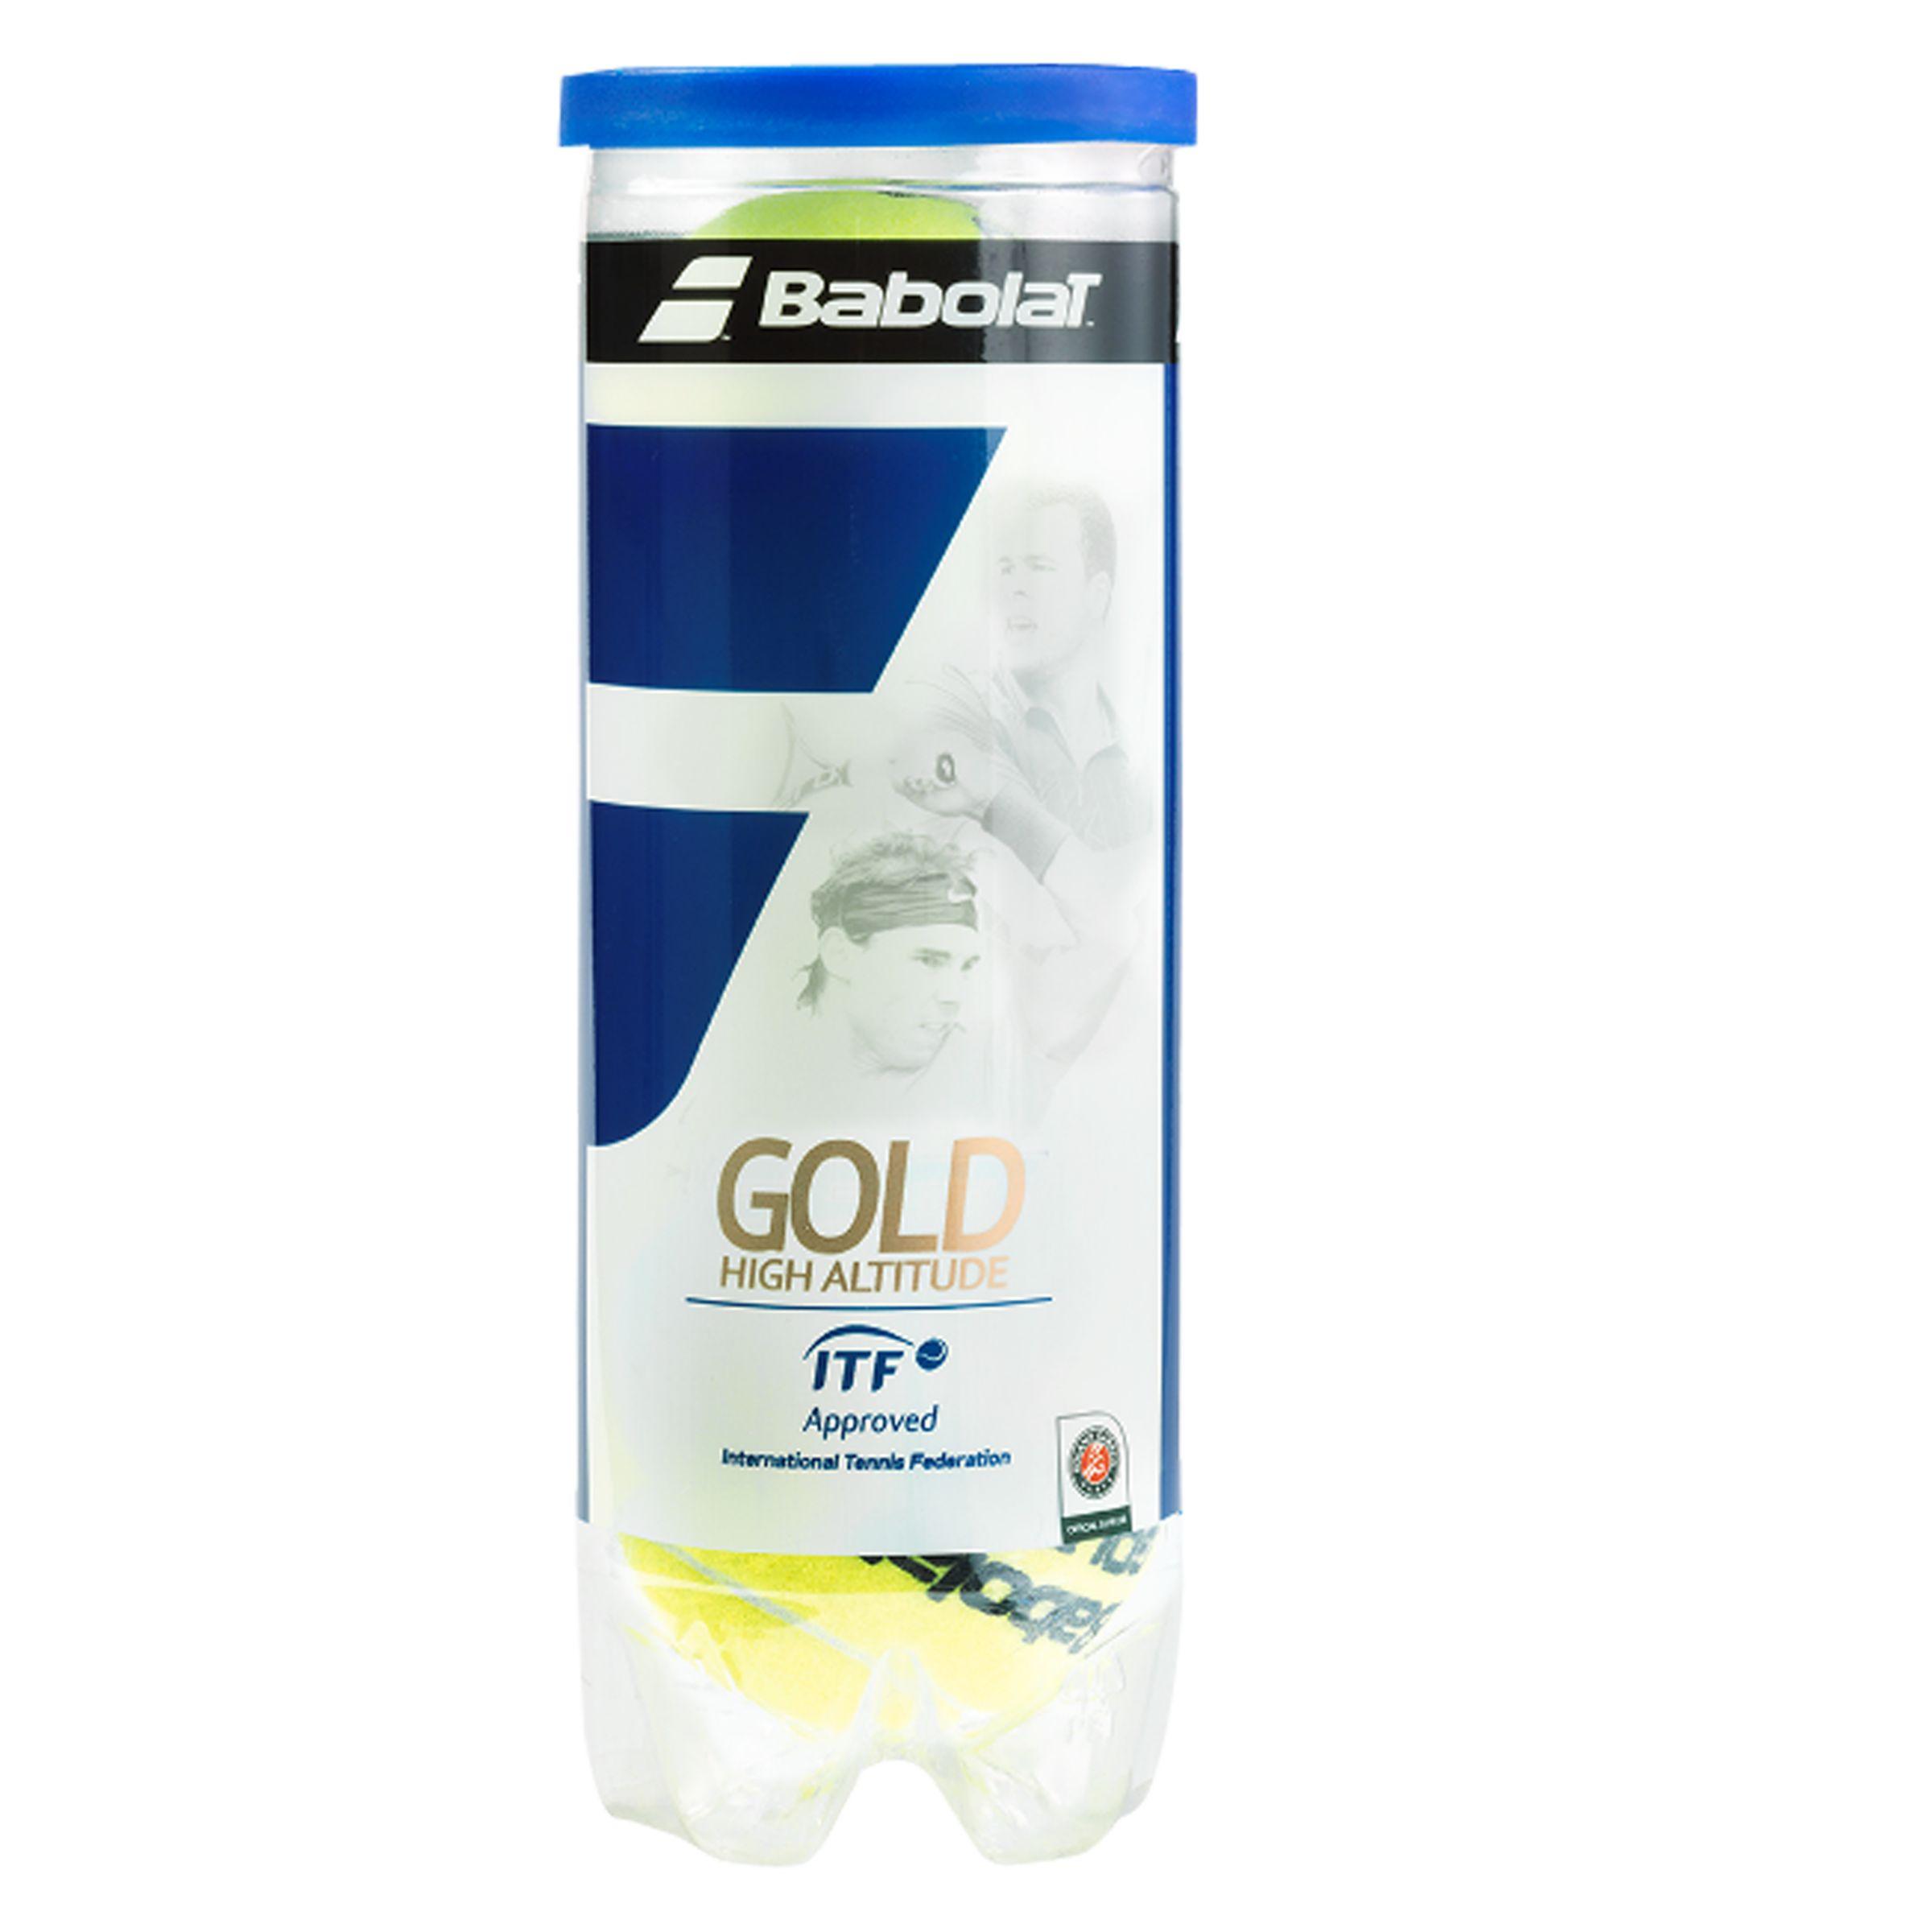 Babolat Babolat Gold Tennis Balls, Pack of 4